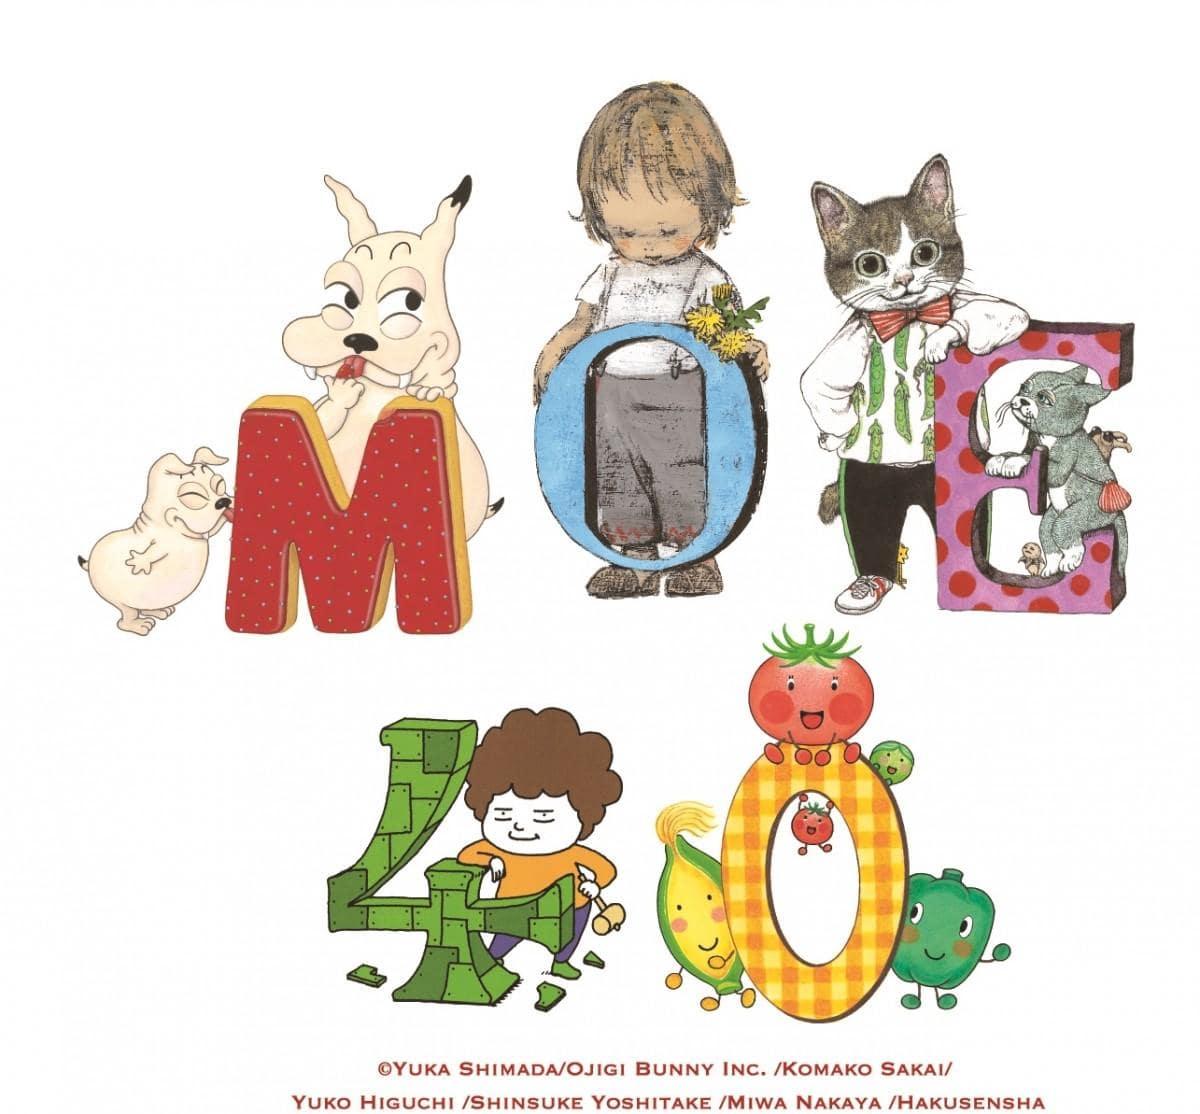 MOE創刊40周年を記念し、絵本の魅力を伝える